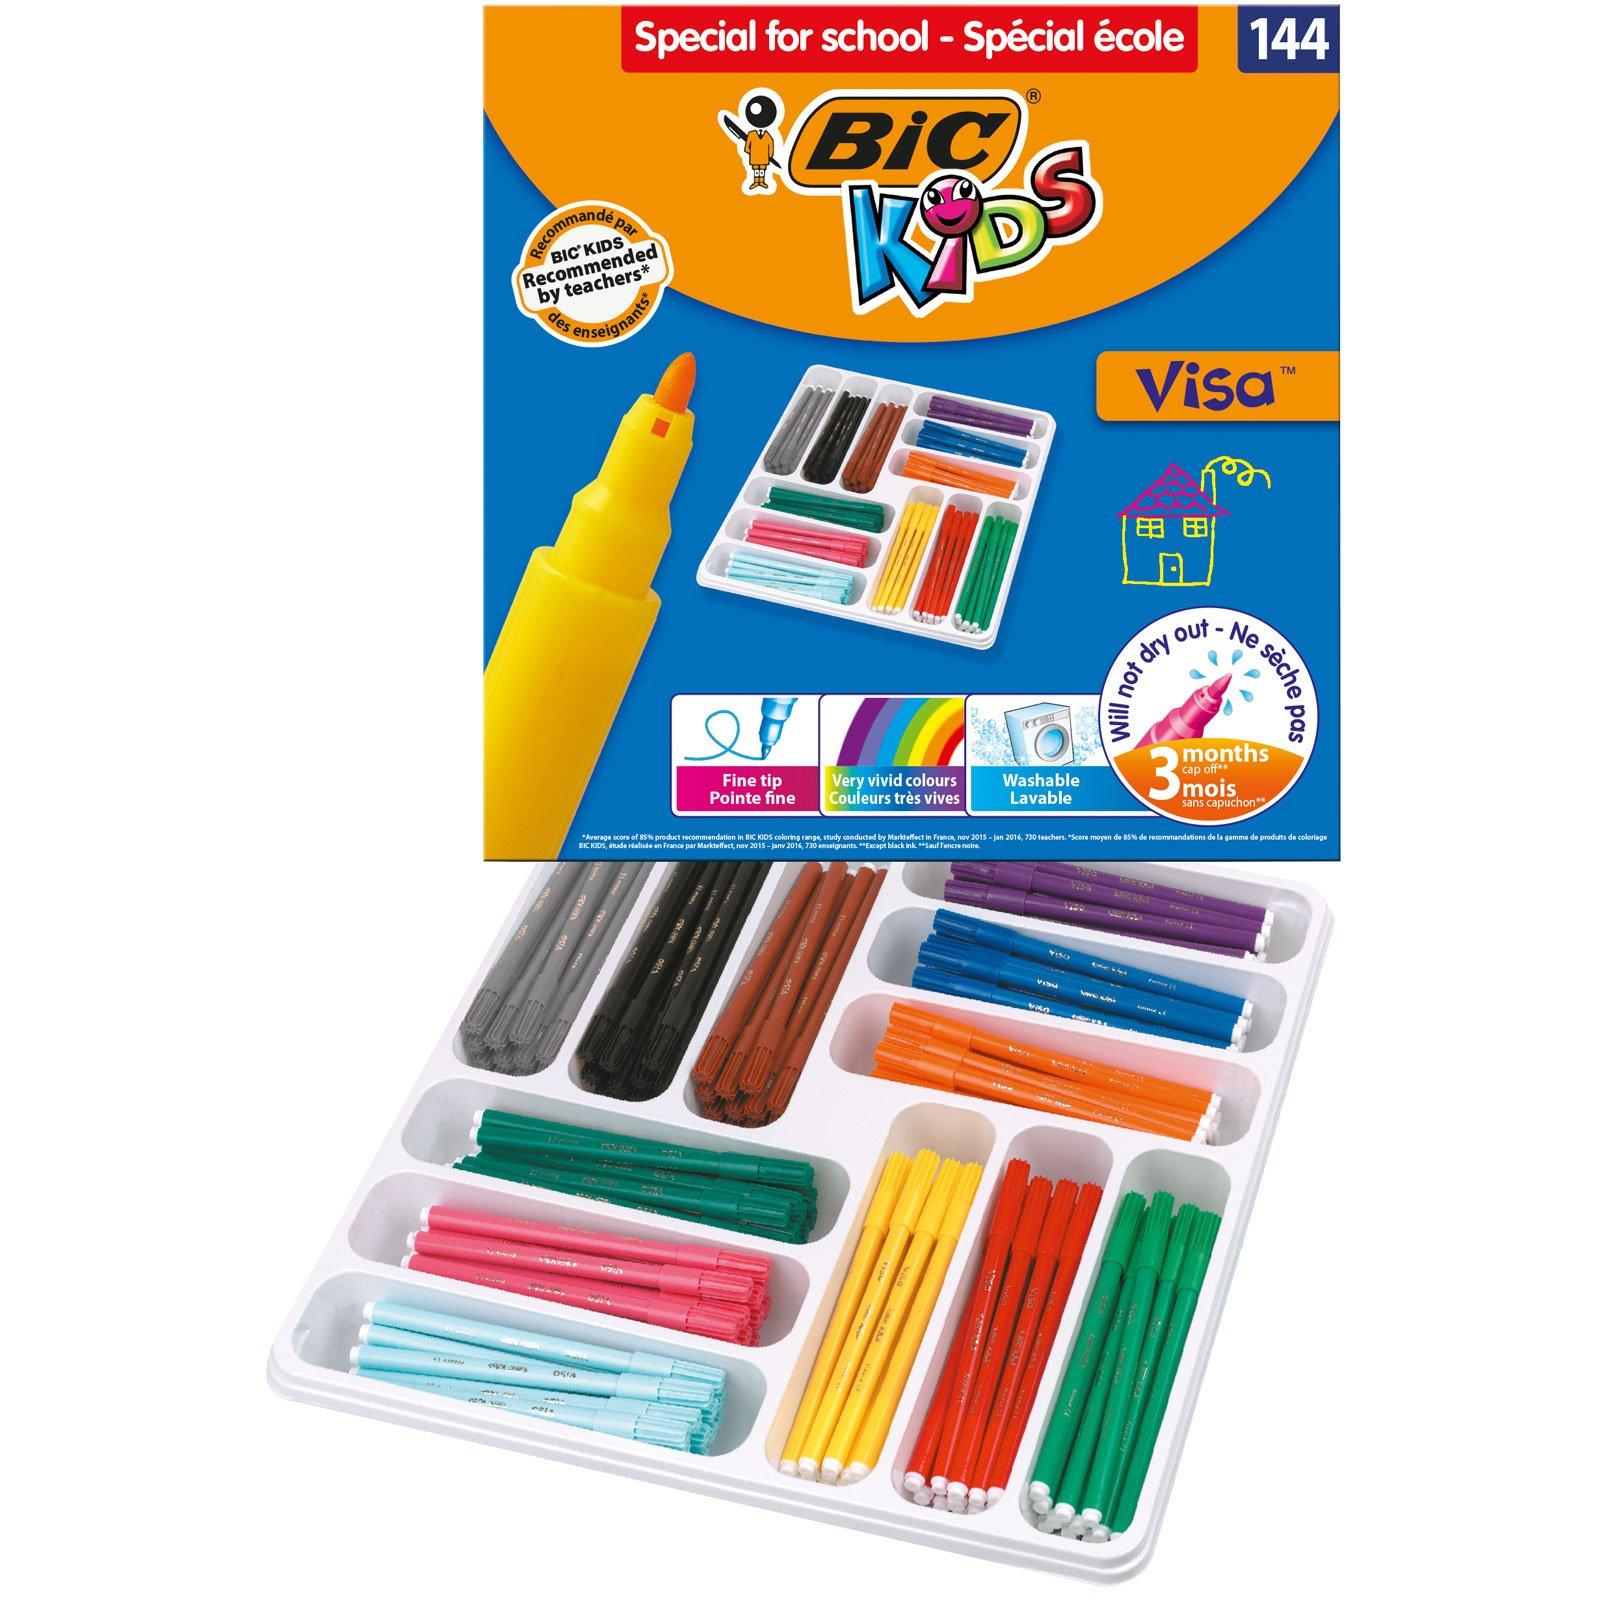 BIC Kids Visa Felt Pens - Assorted Colours, Classpack of 144 by BIC